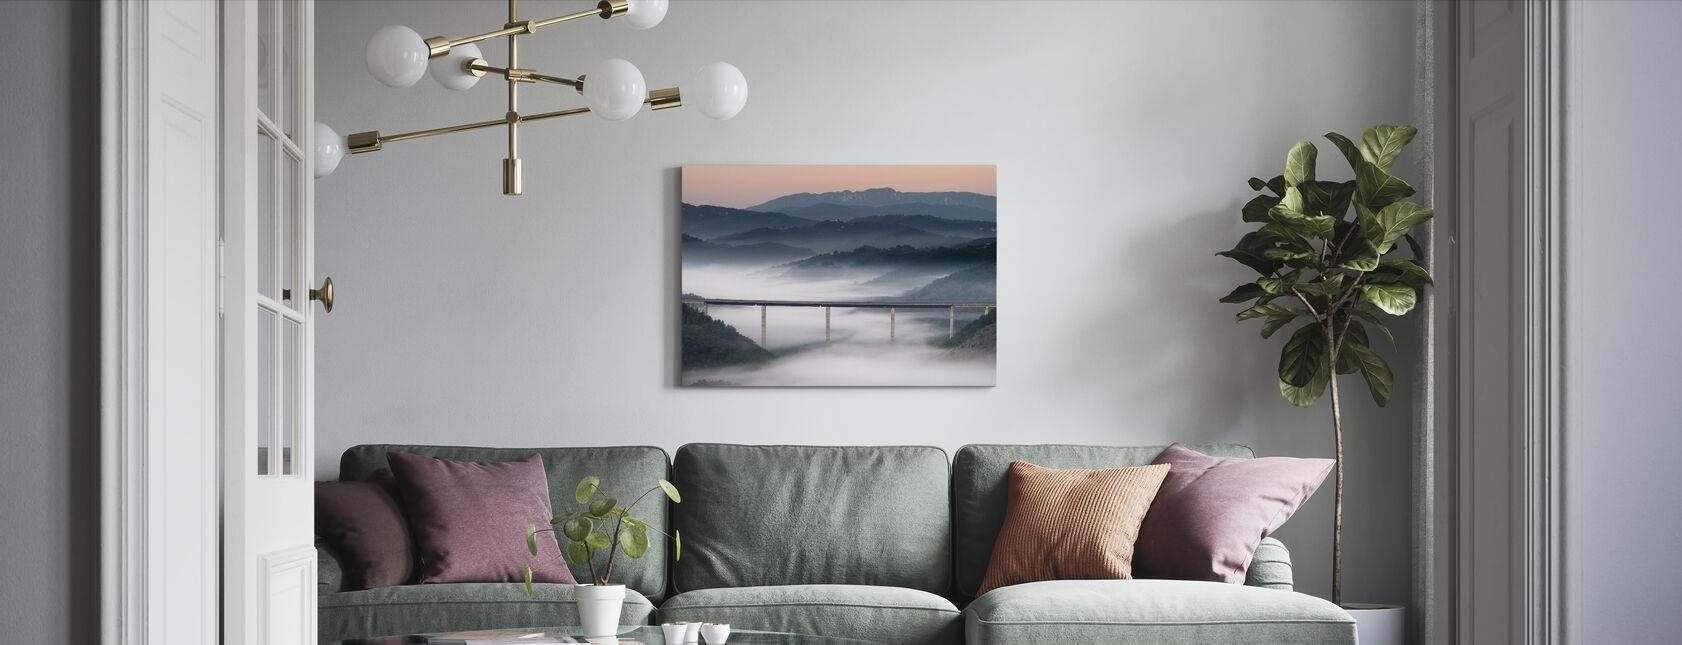 Misty Bridge - Canvas print - Living Room